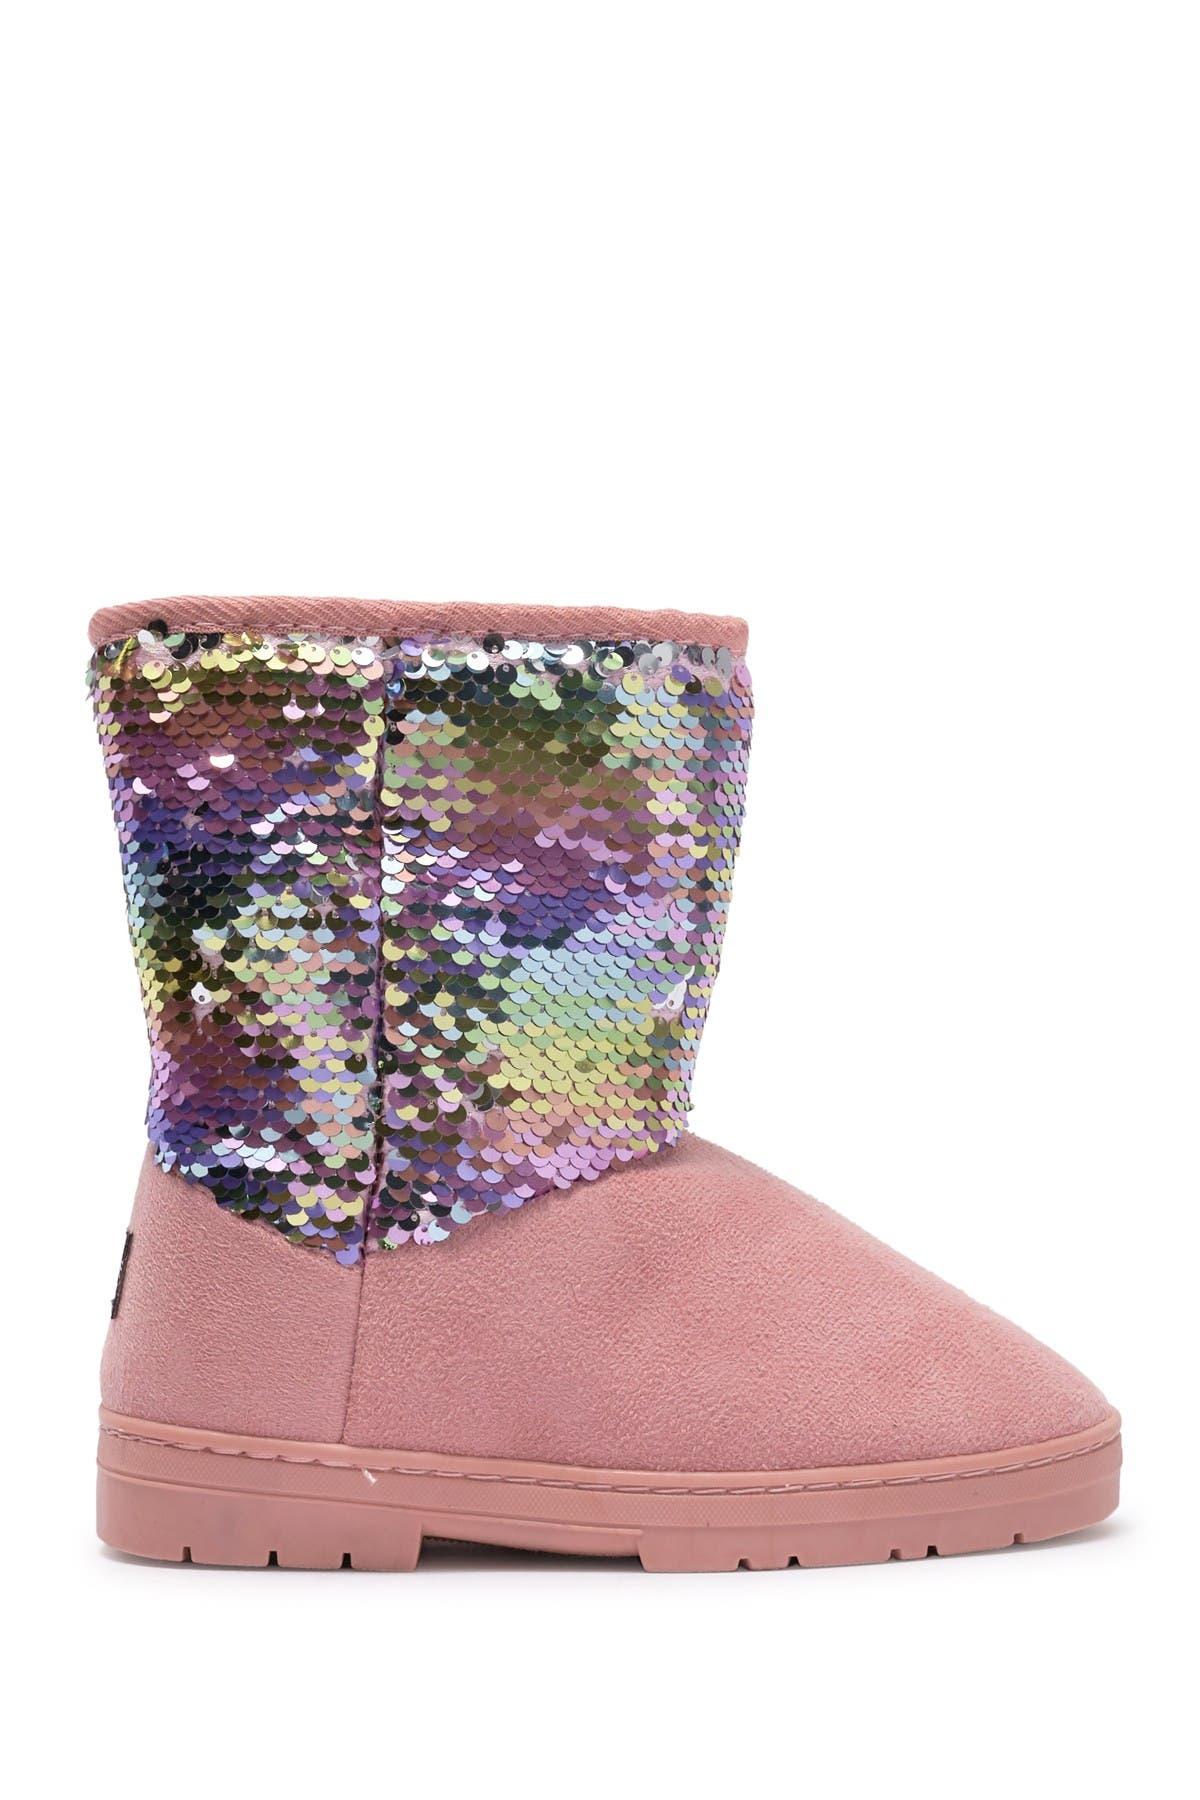 Bebe Microsuede Sequin Faux Fur Lined Winter Boot